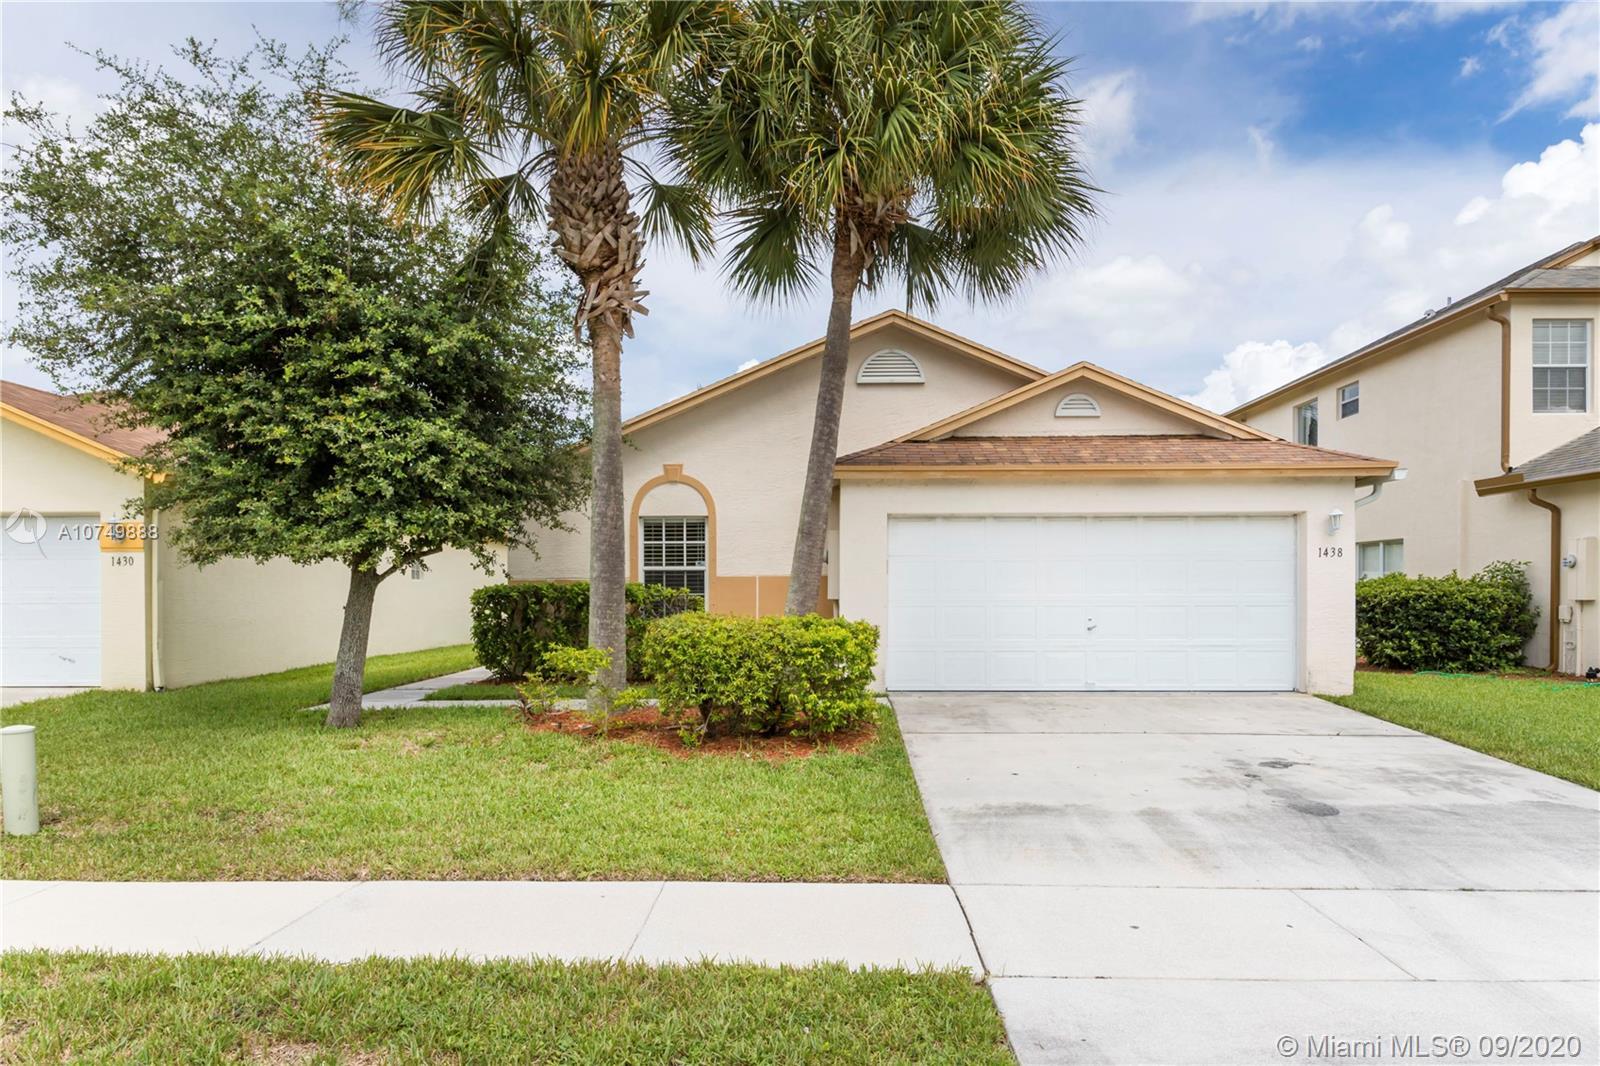 1438 Red Apple Ln, West Palm Beach, FL 33415